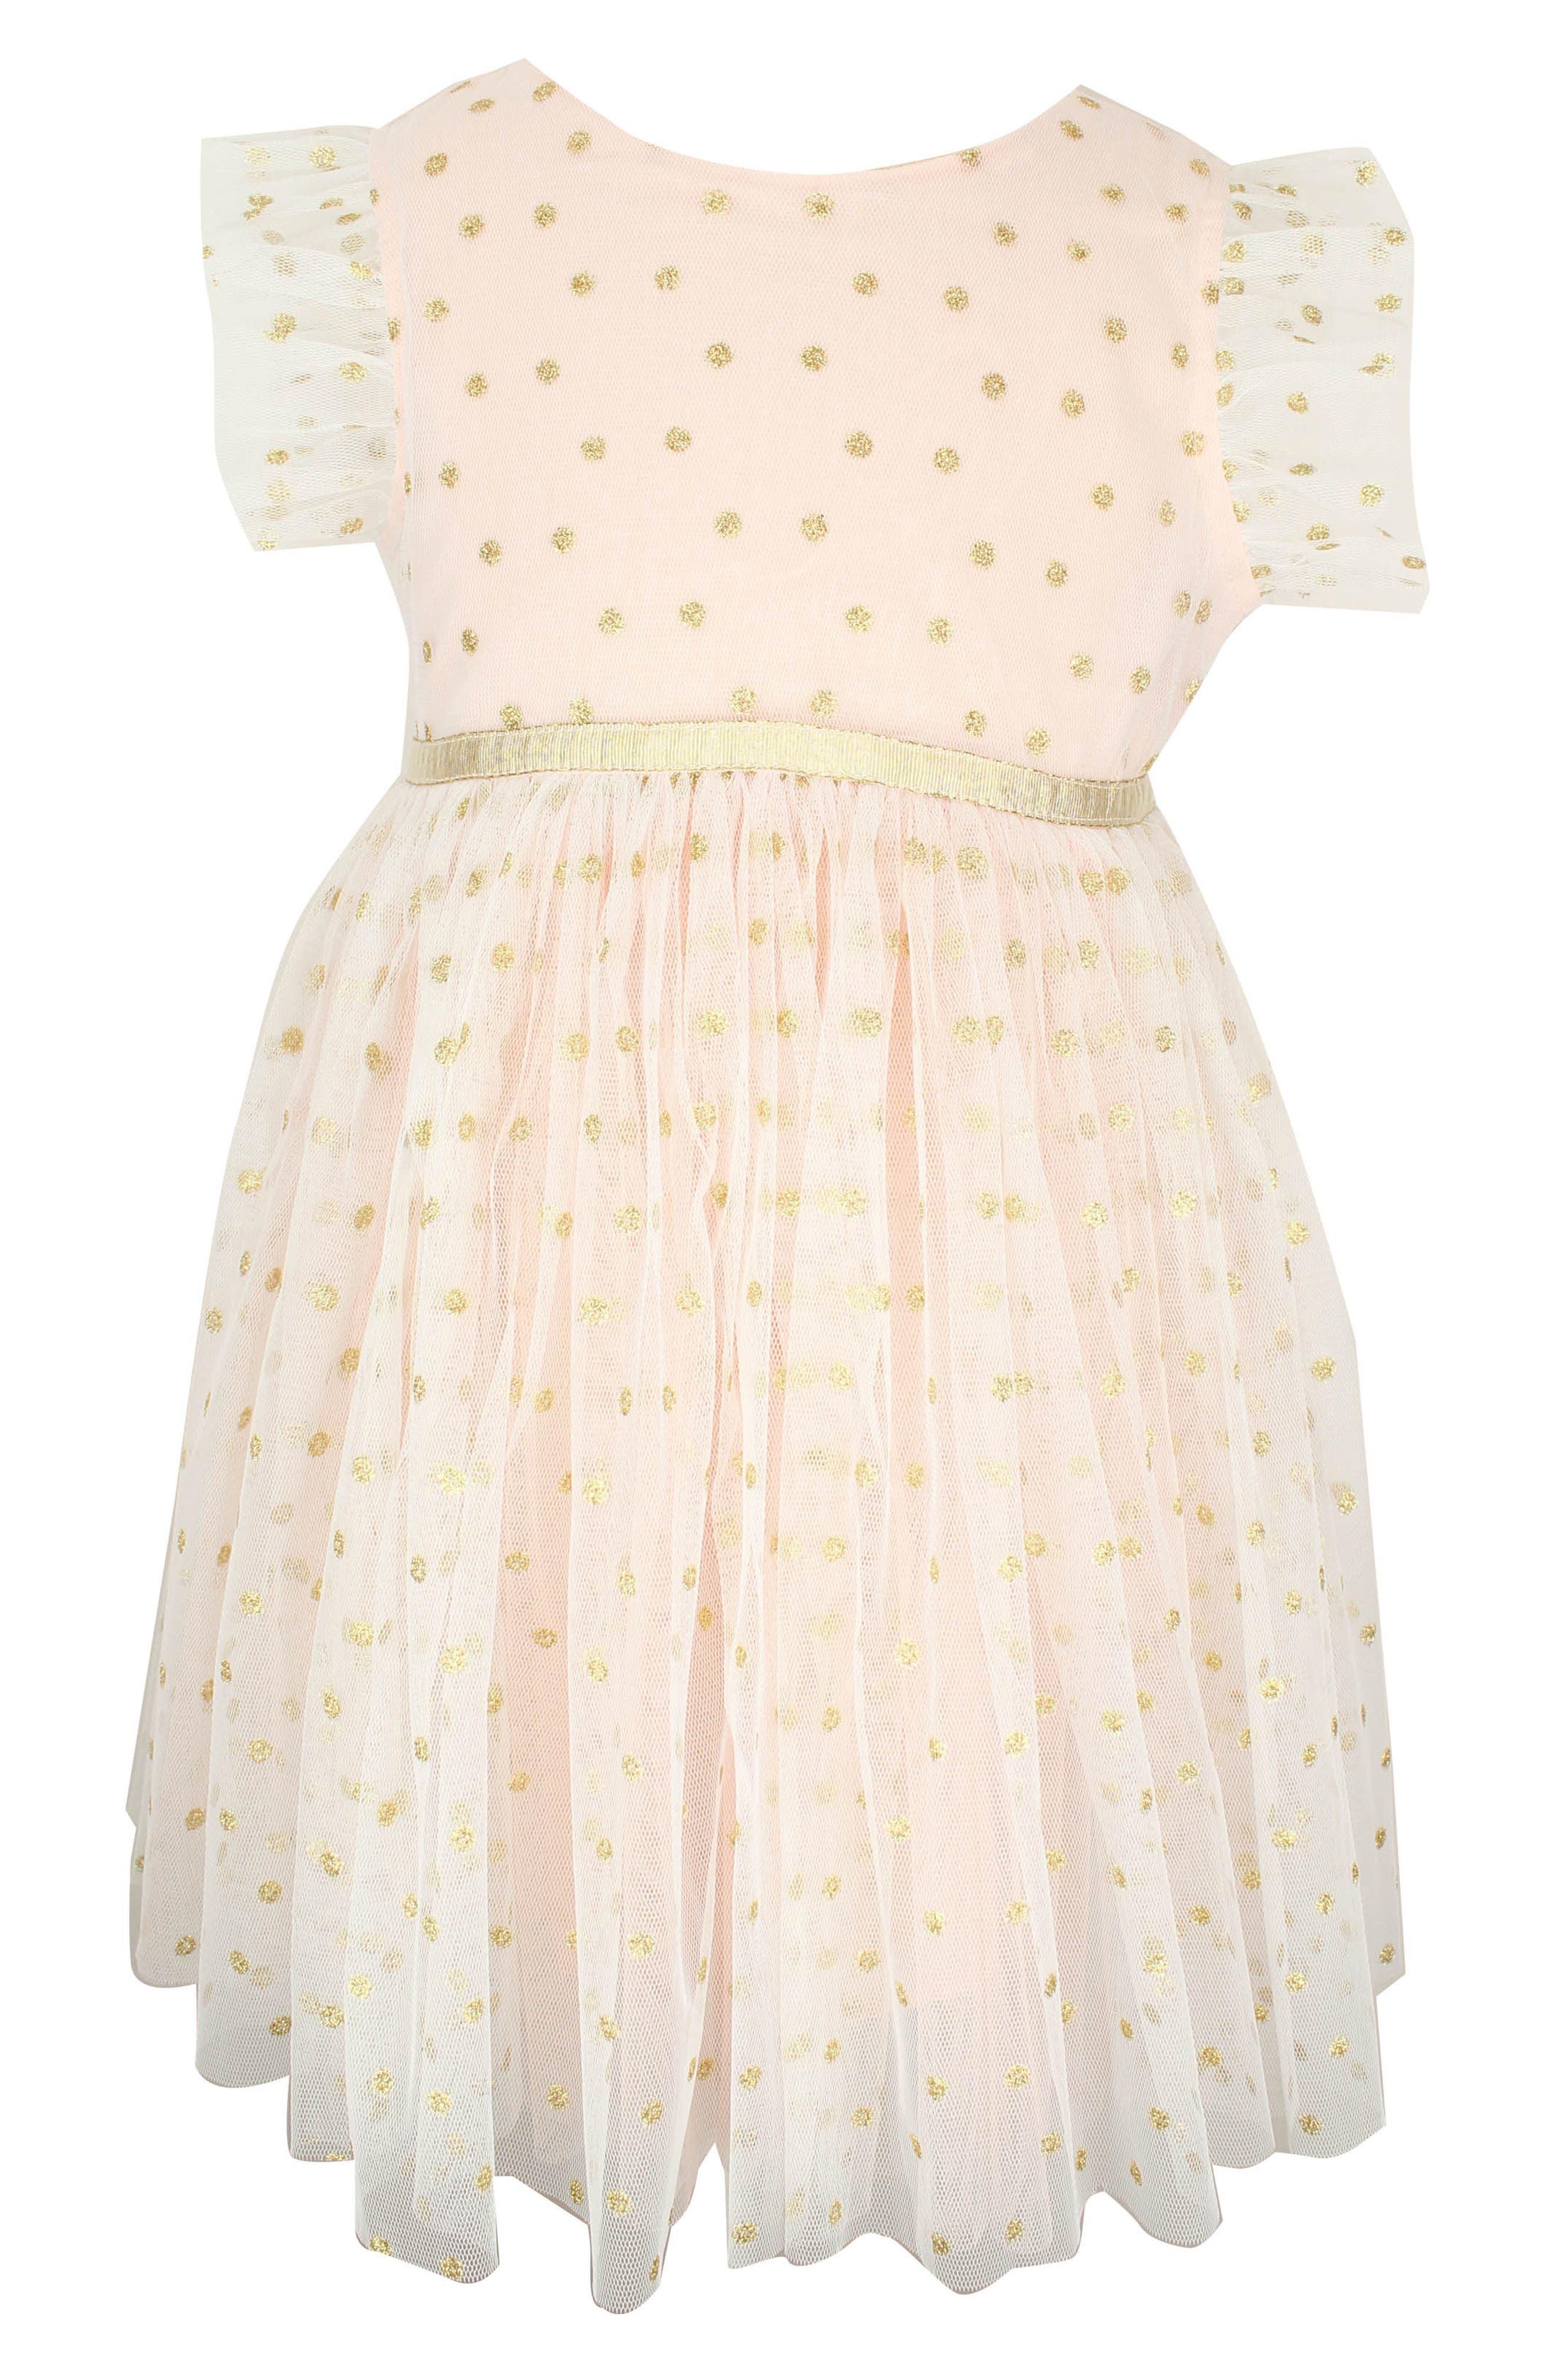 POPATU, Dotted Tulle Dress, Main thumbnail 1, color, PEACH